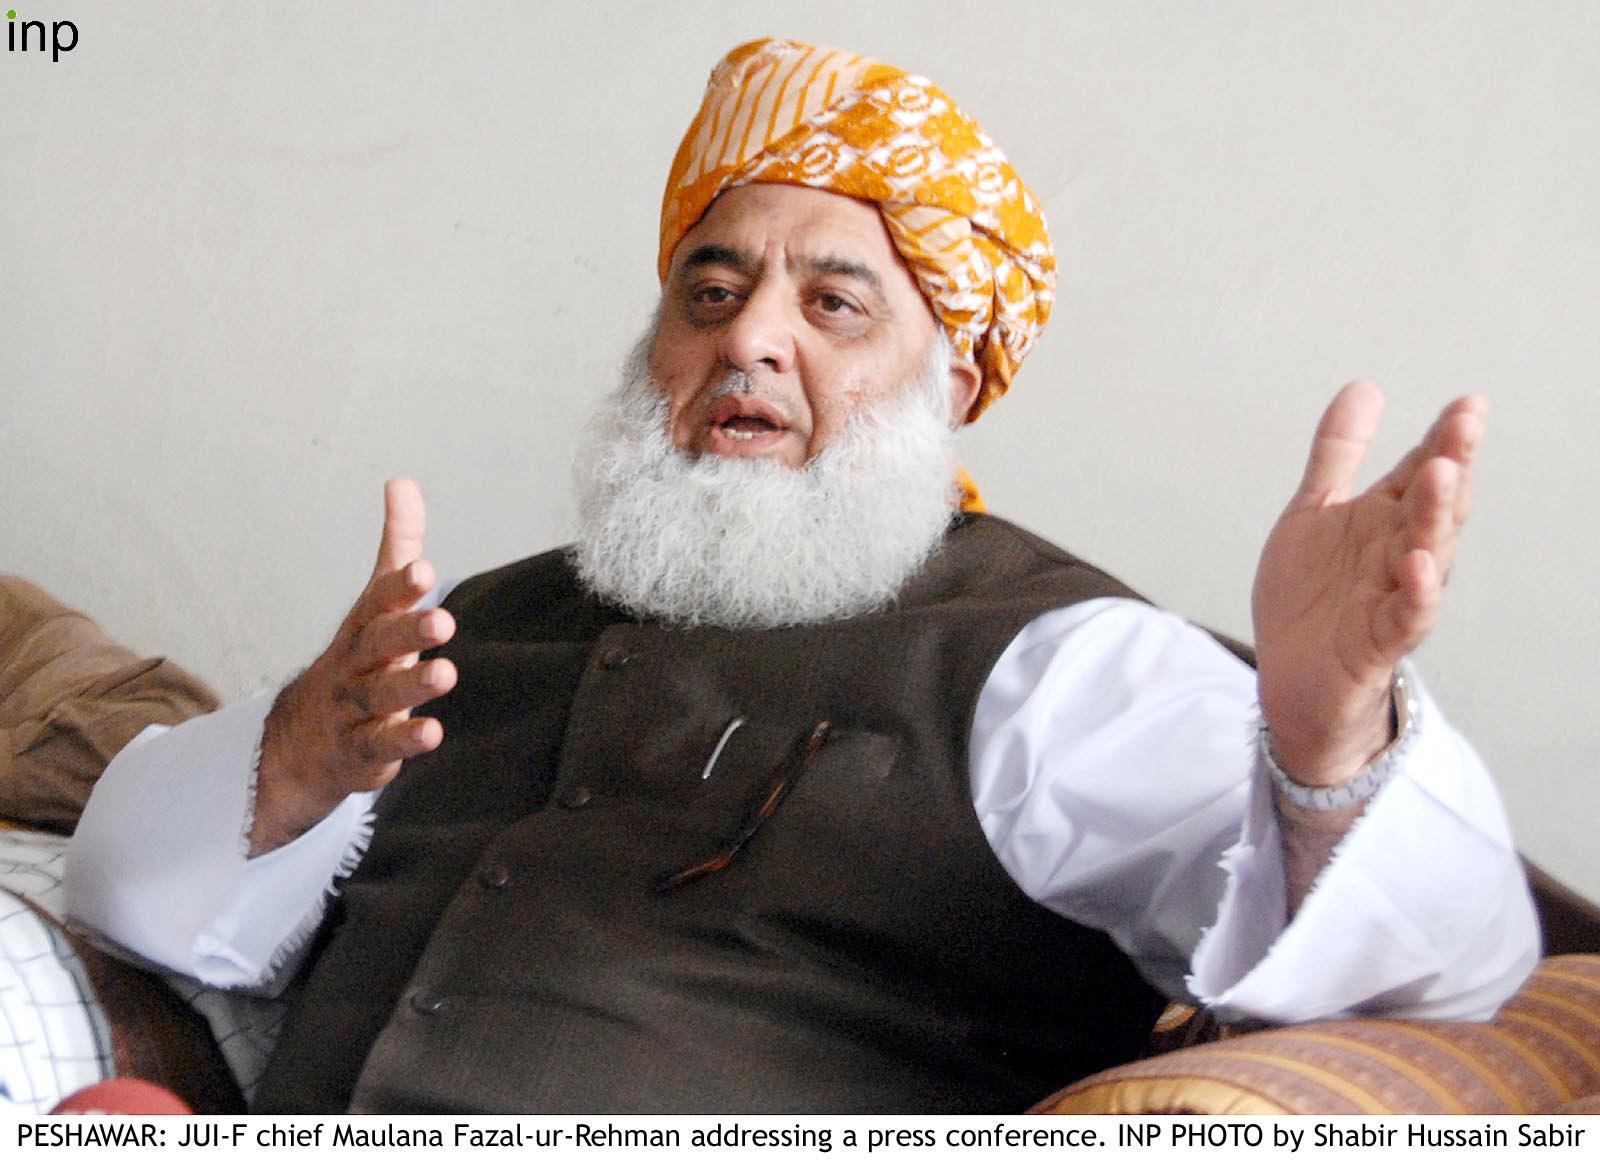 fazlur rehman condemns us move to sanction hizbul mujahideen